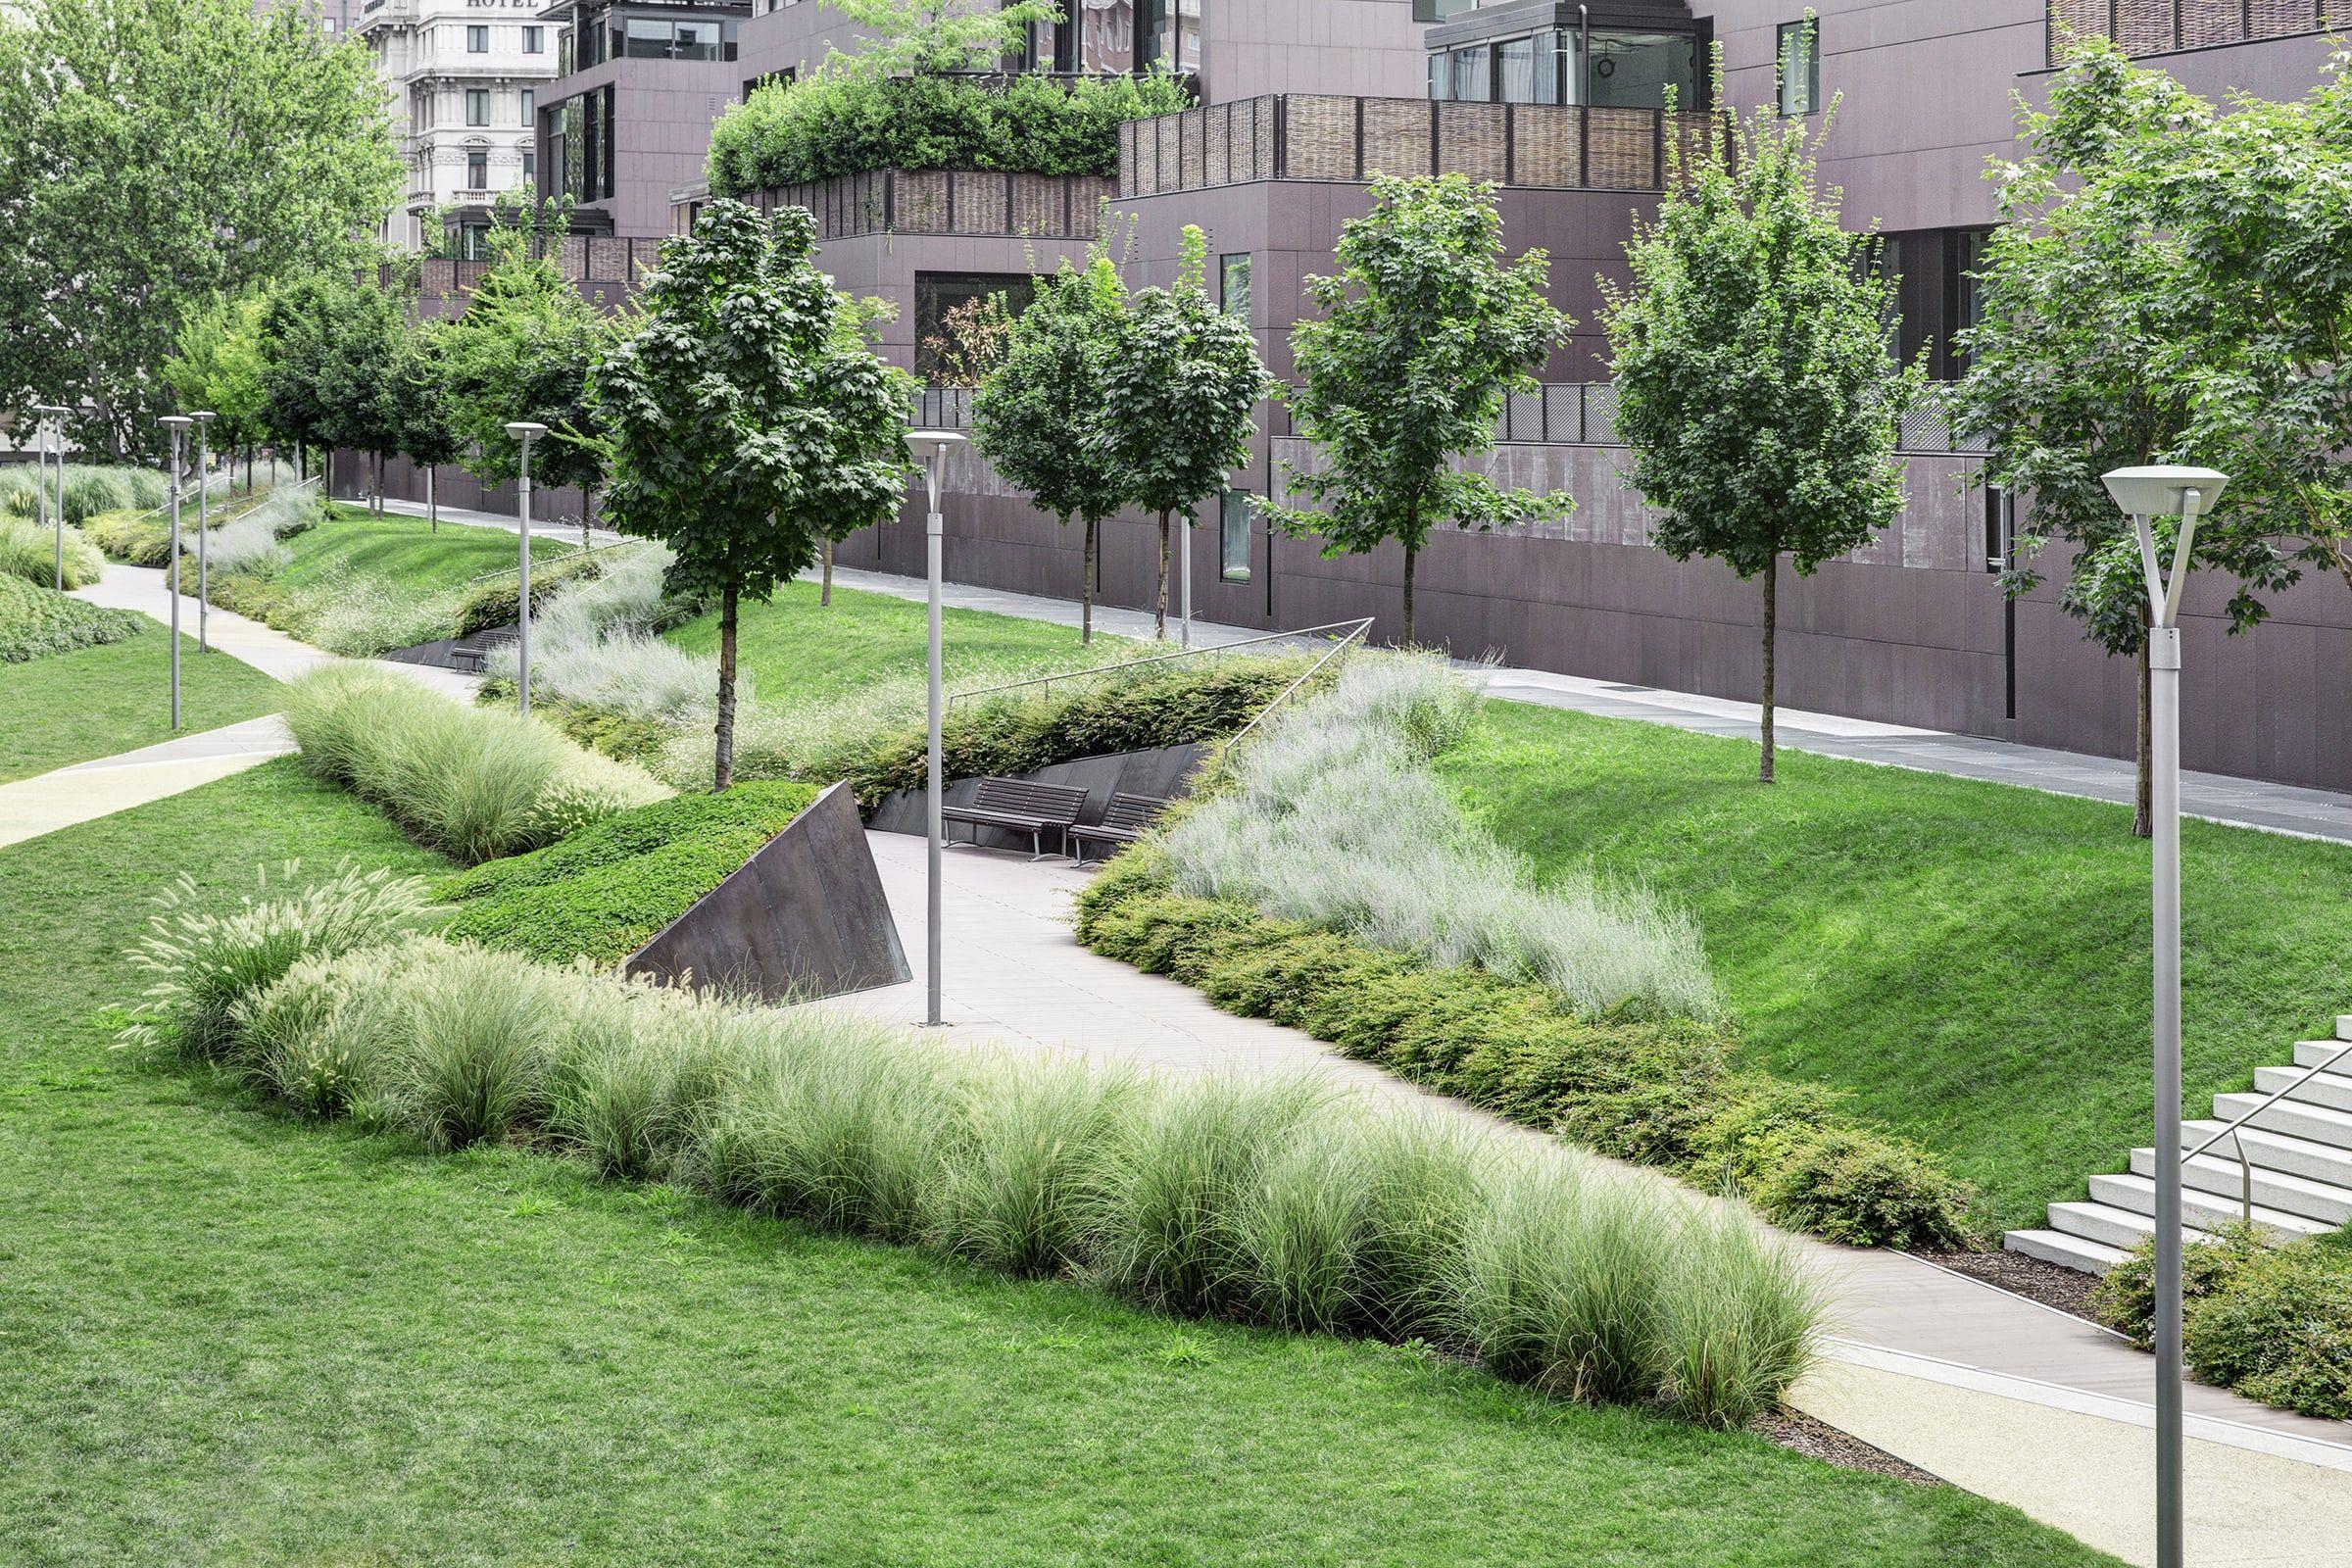 Land Giovanni Nardi Varesine Porta Nuova Divisare Public Garden Design Public Garden Landscape And Urbanism